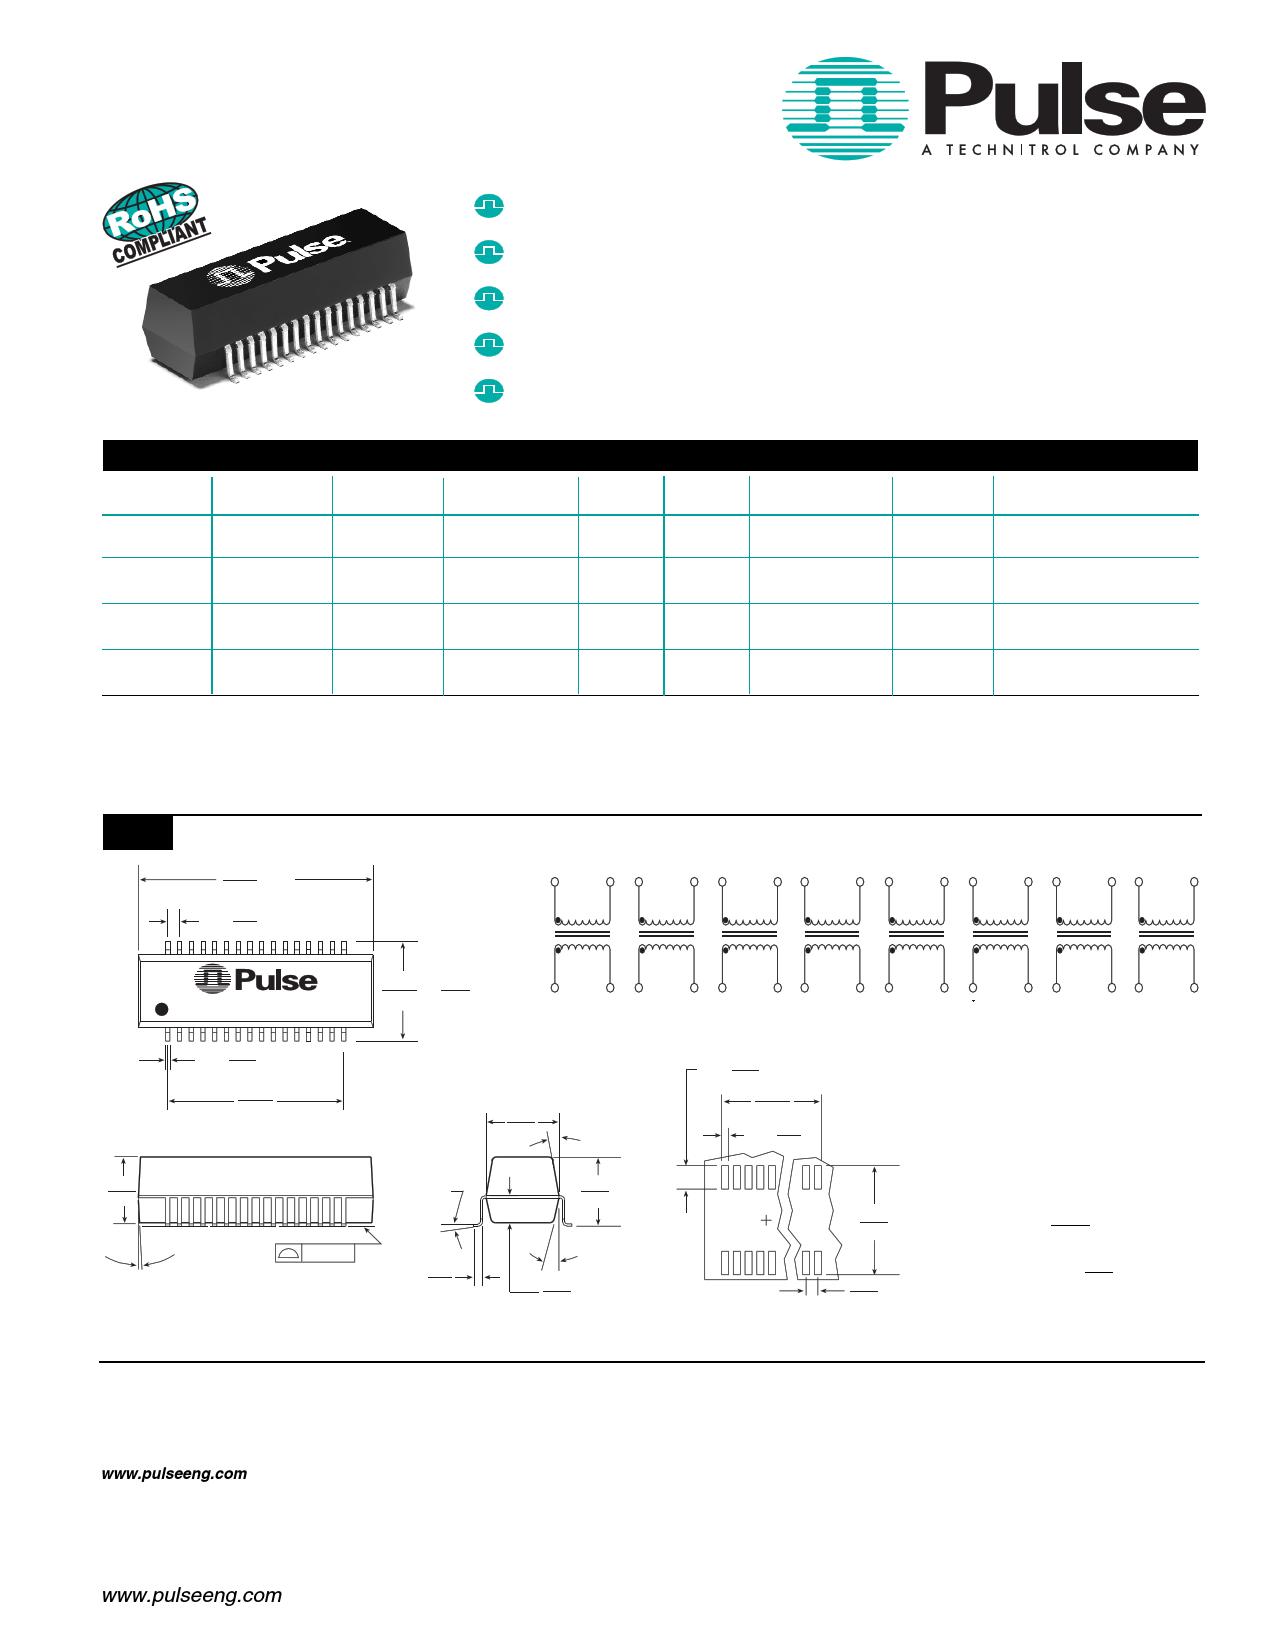 T3049NL 데이터시트 및 T3049NL PDF